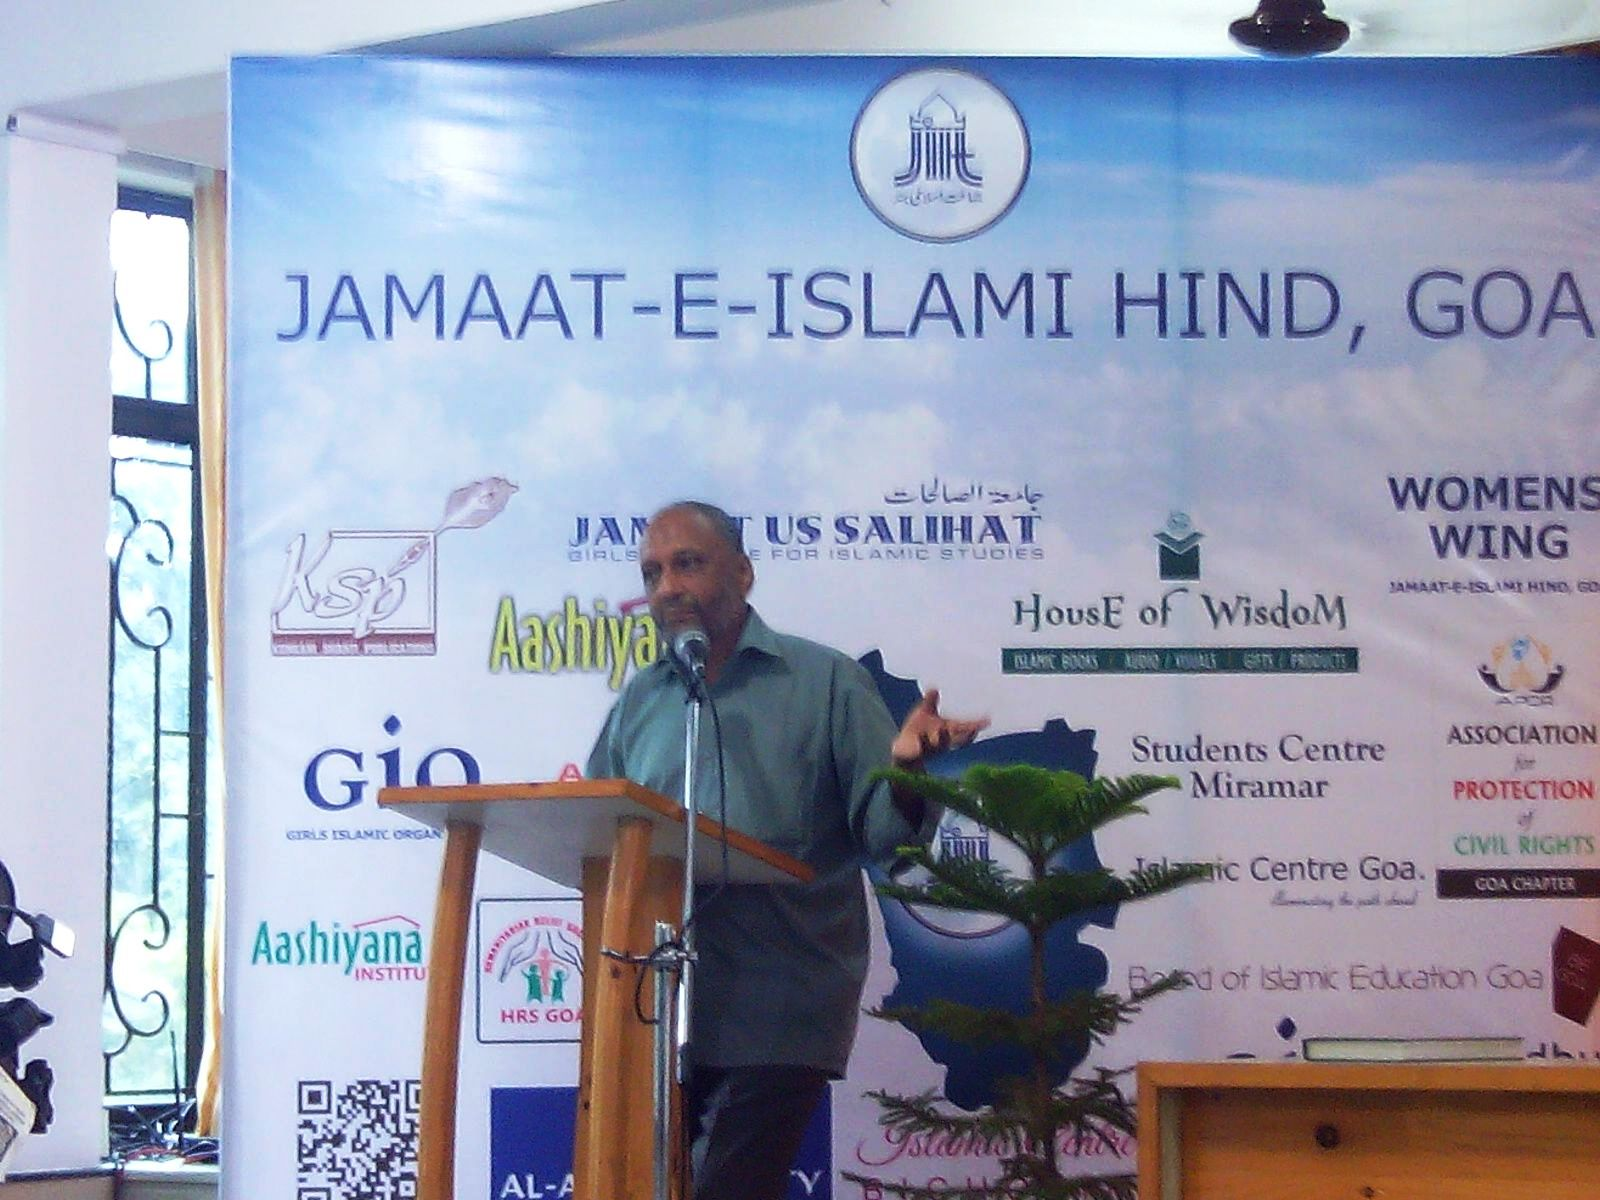 Jb. Abdul Wahid Khan [Ameer- e- Halqa - Goa] addressing the gathering